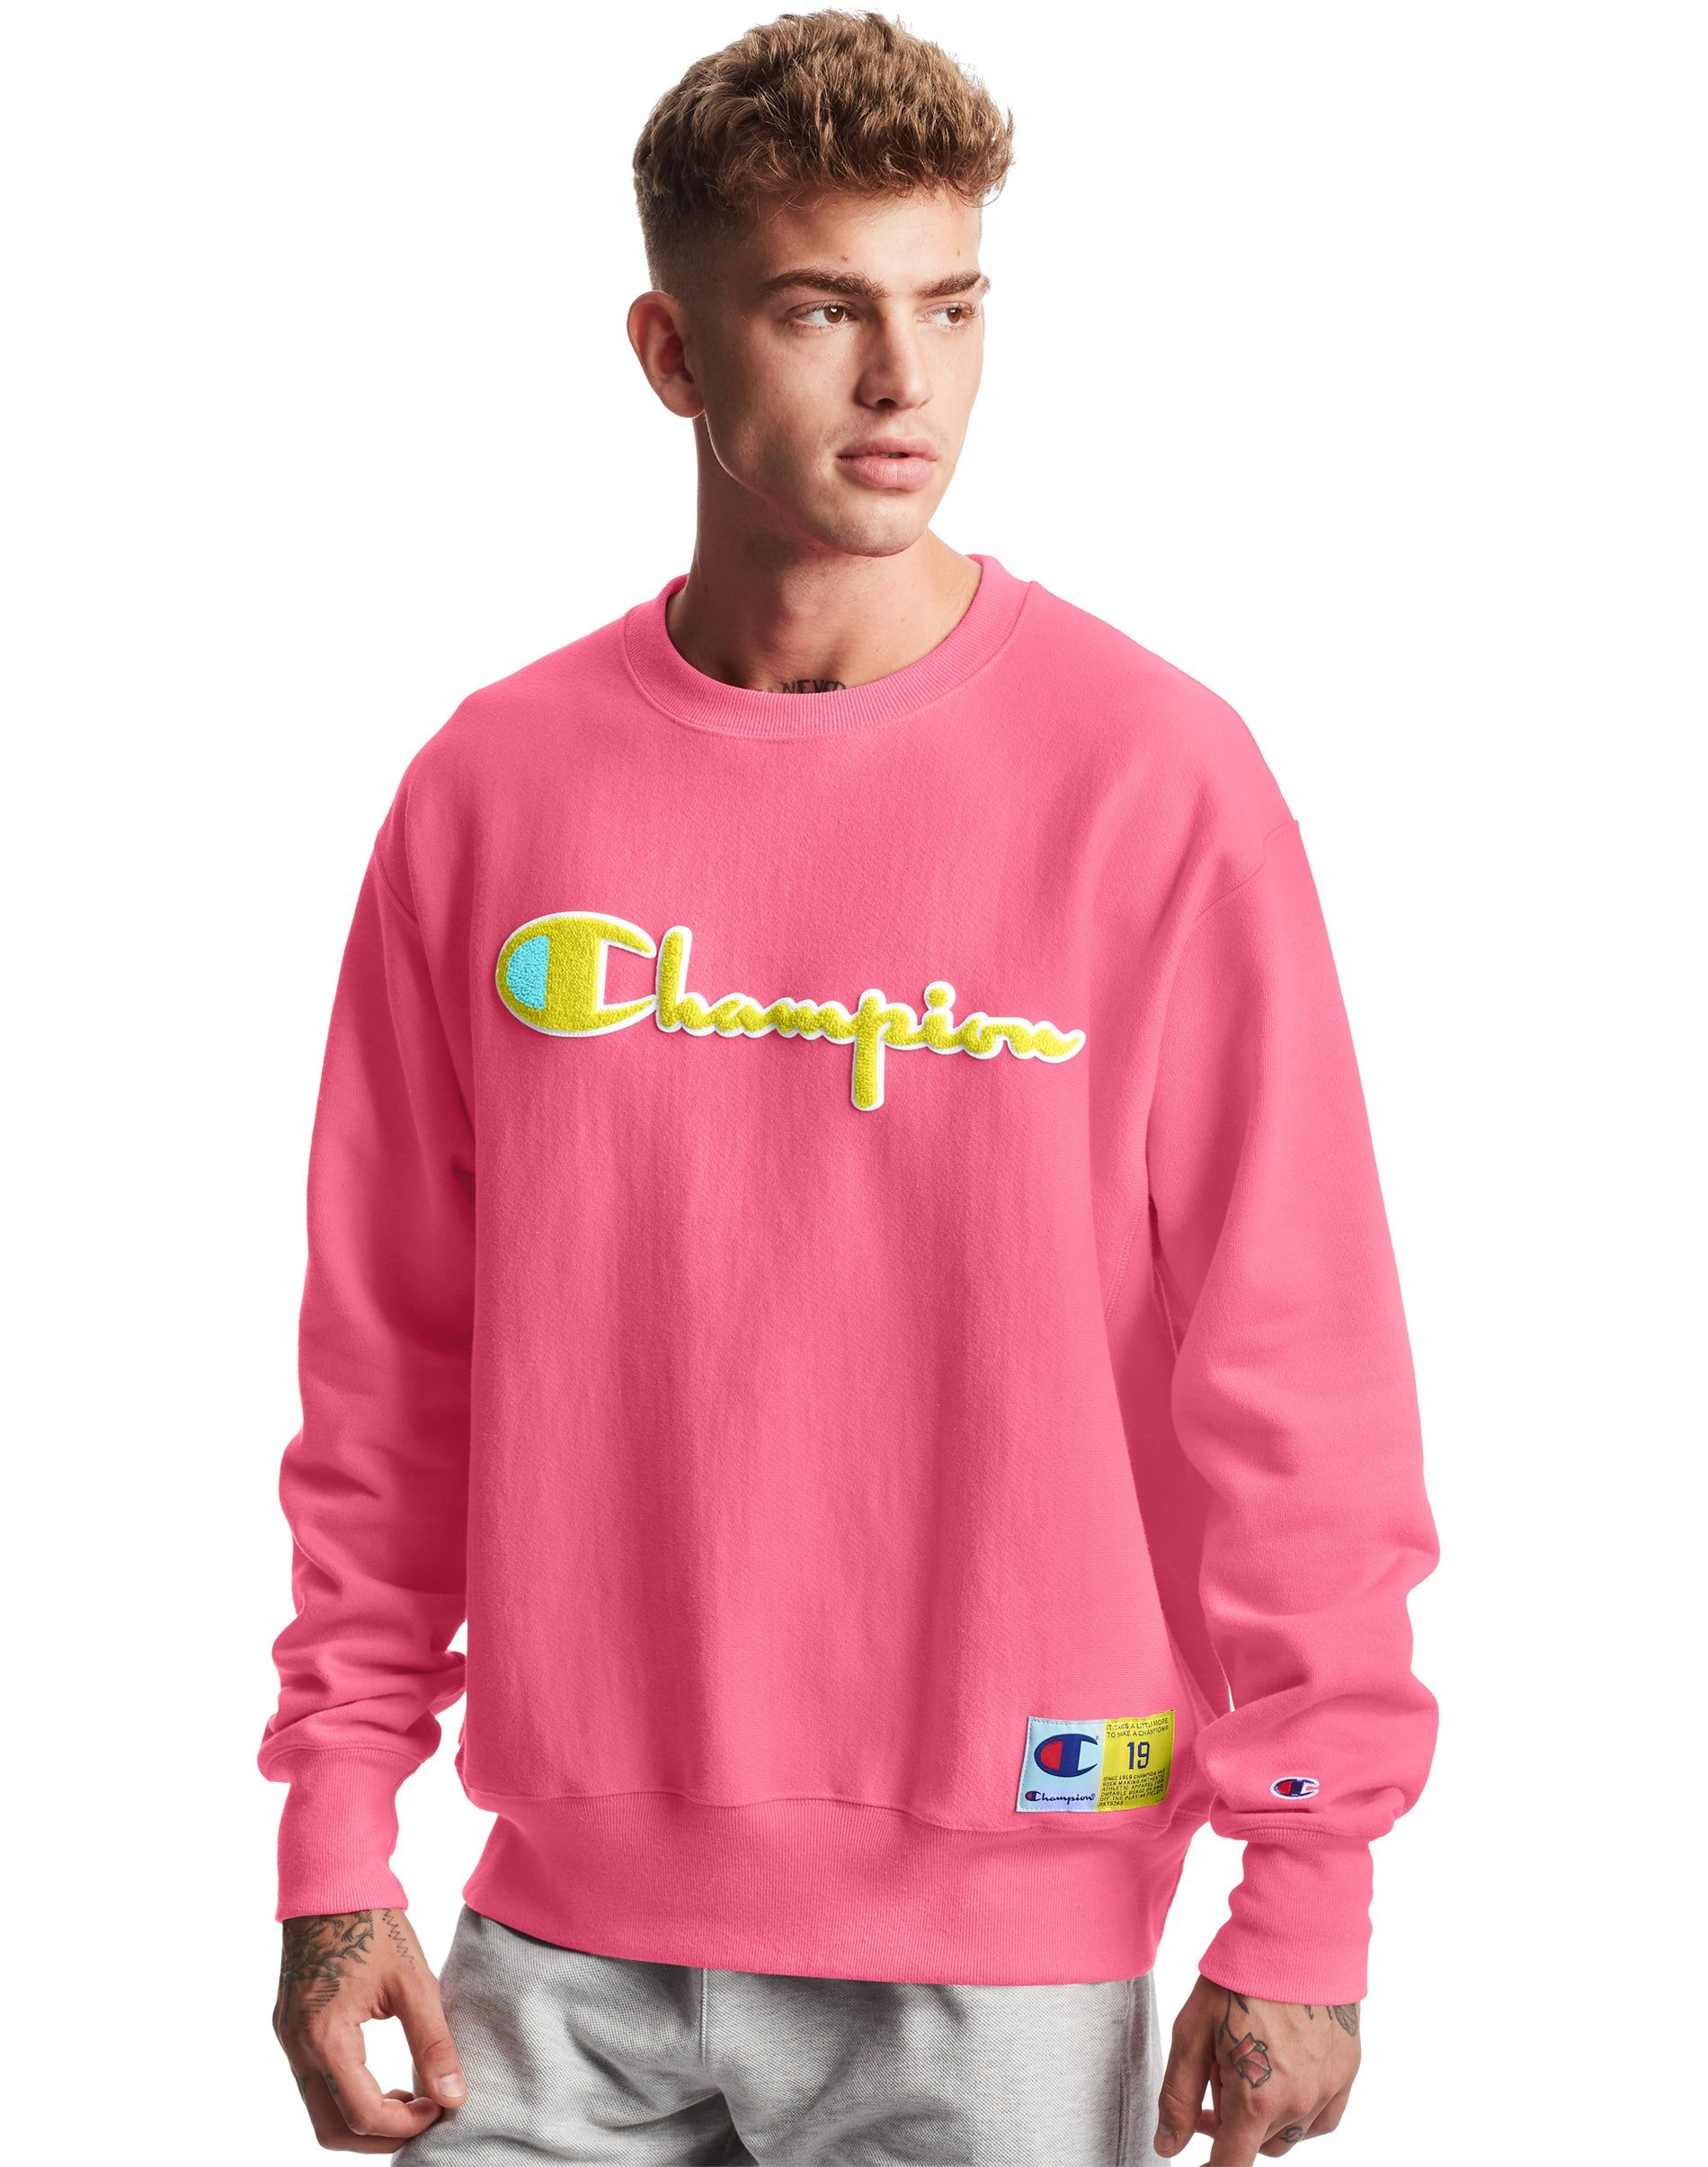 Predownload: Men S Champion Life Reverse Weave Crew Chenille Logo Reef Pink Mens Sweatshirts Hoodie Mens Trendy Outfits Mens Sweatshirts [ 2410 x 1900 Pixel ]